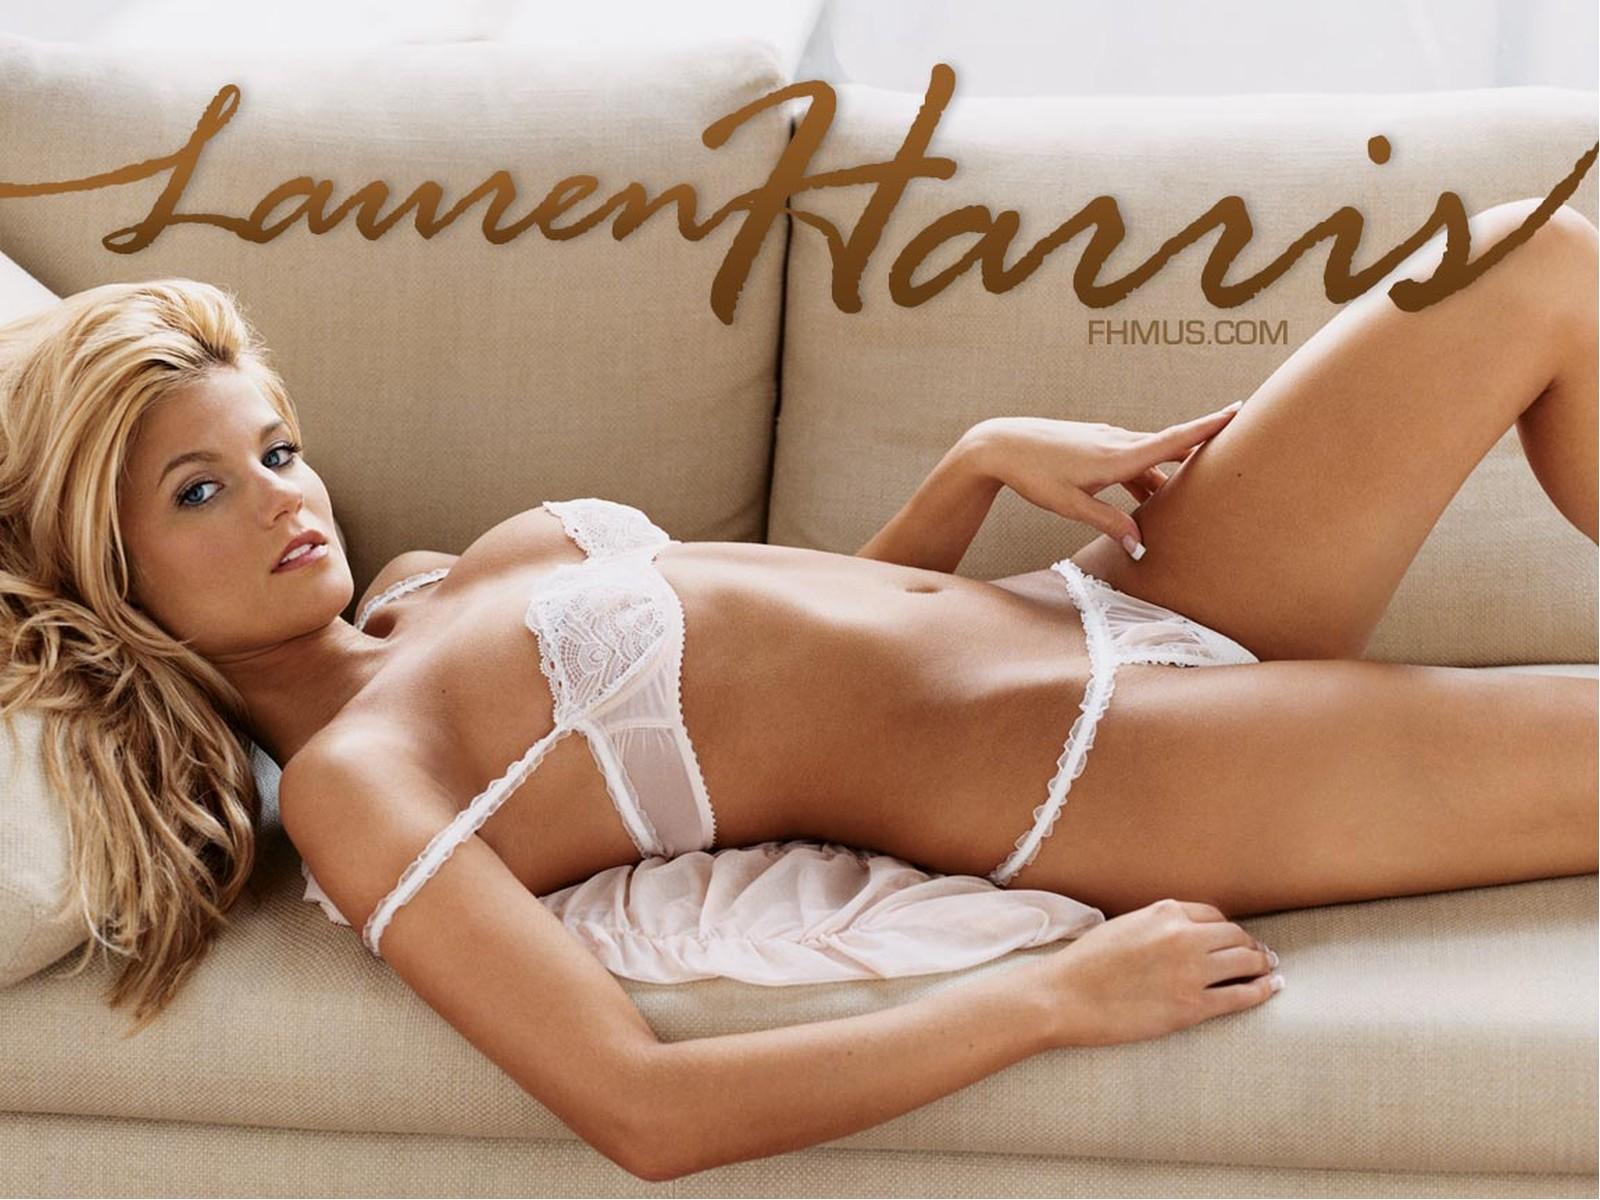 Download HQ white lingerie Lauren Harris wallpaper / 1600x1200